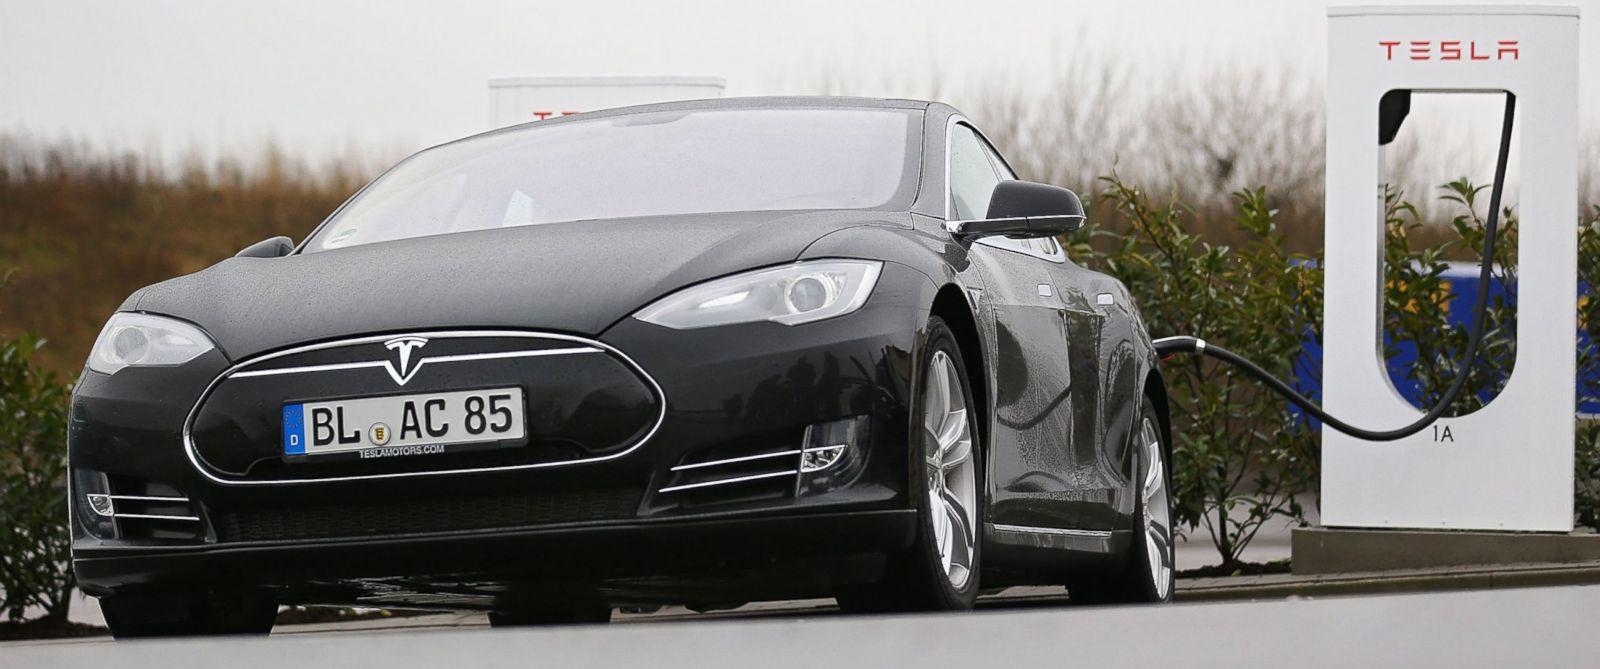 Elon Musk Working on Snake-Like Charger for Tesla Cars ...